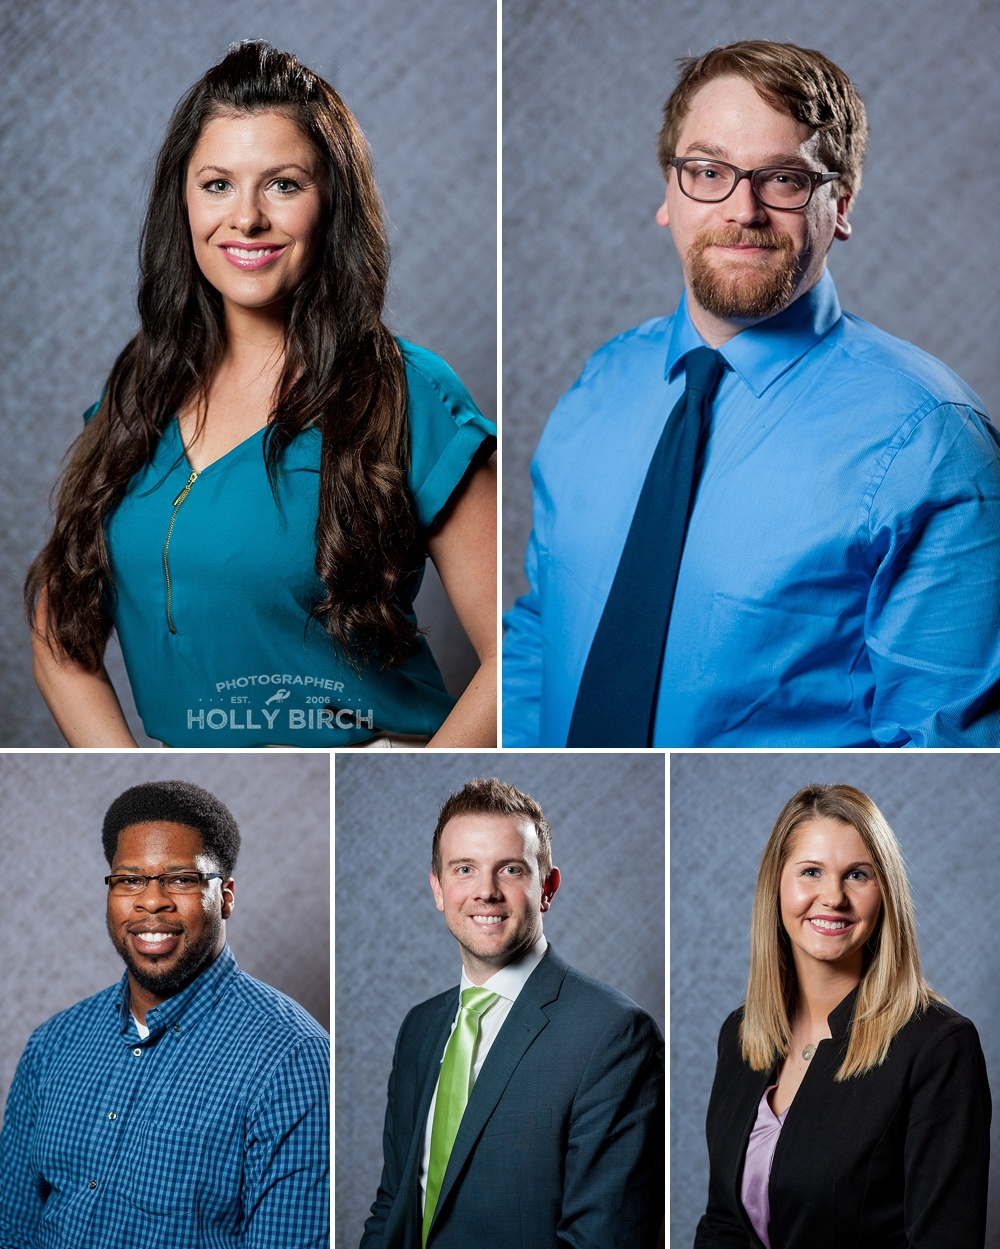 business professionals and entrepreneur LinkedIn headshots